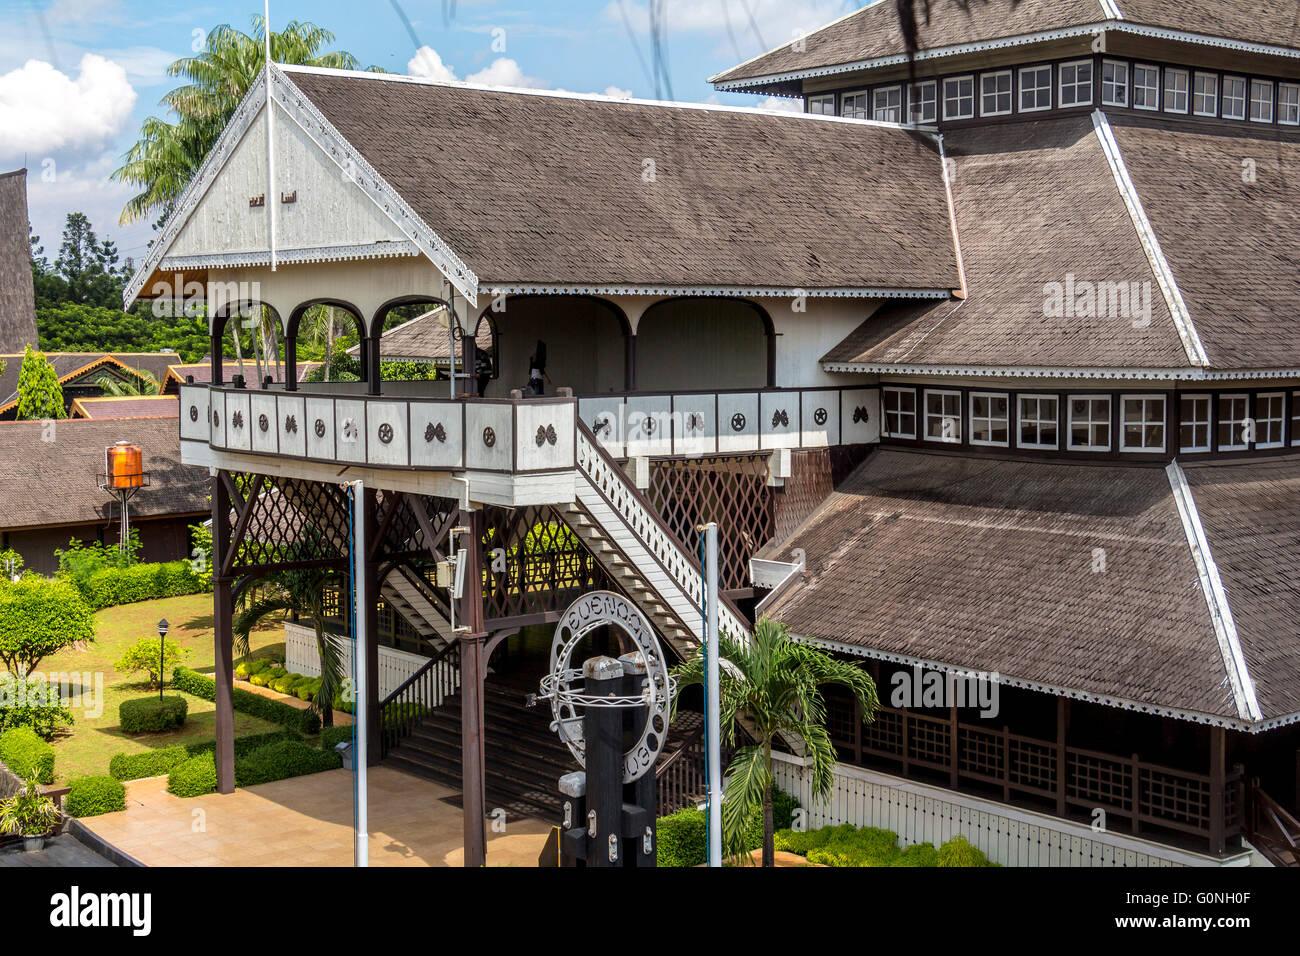 Inside taman mini park in Jakarta - Stock Image